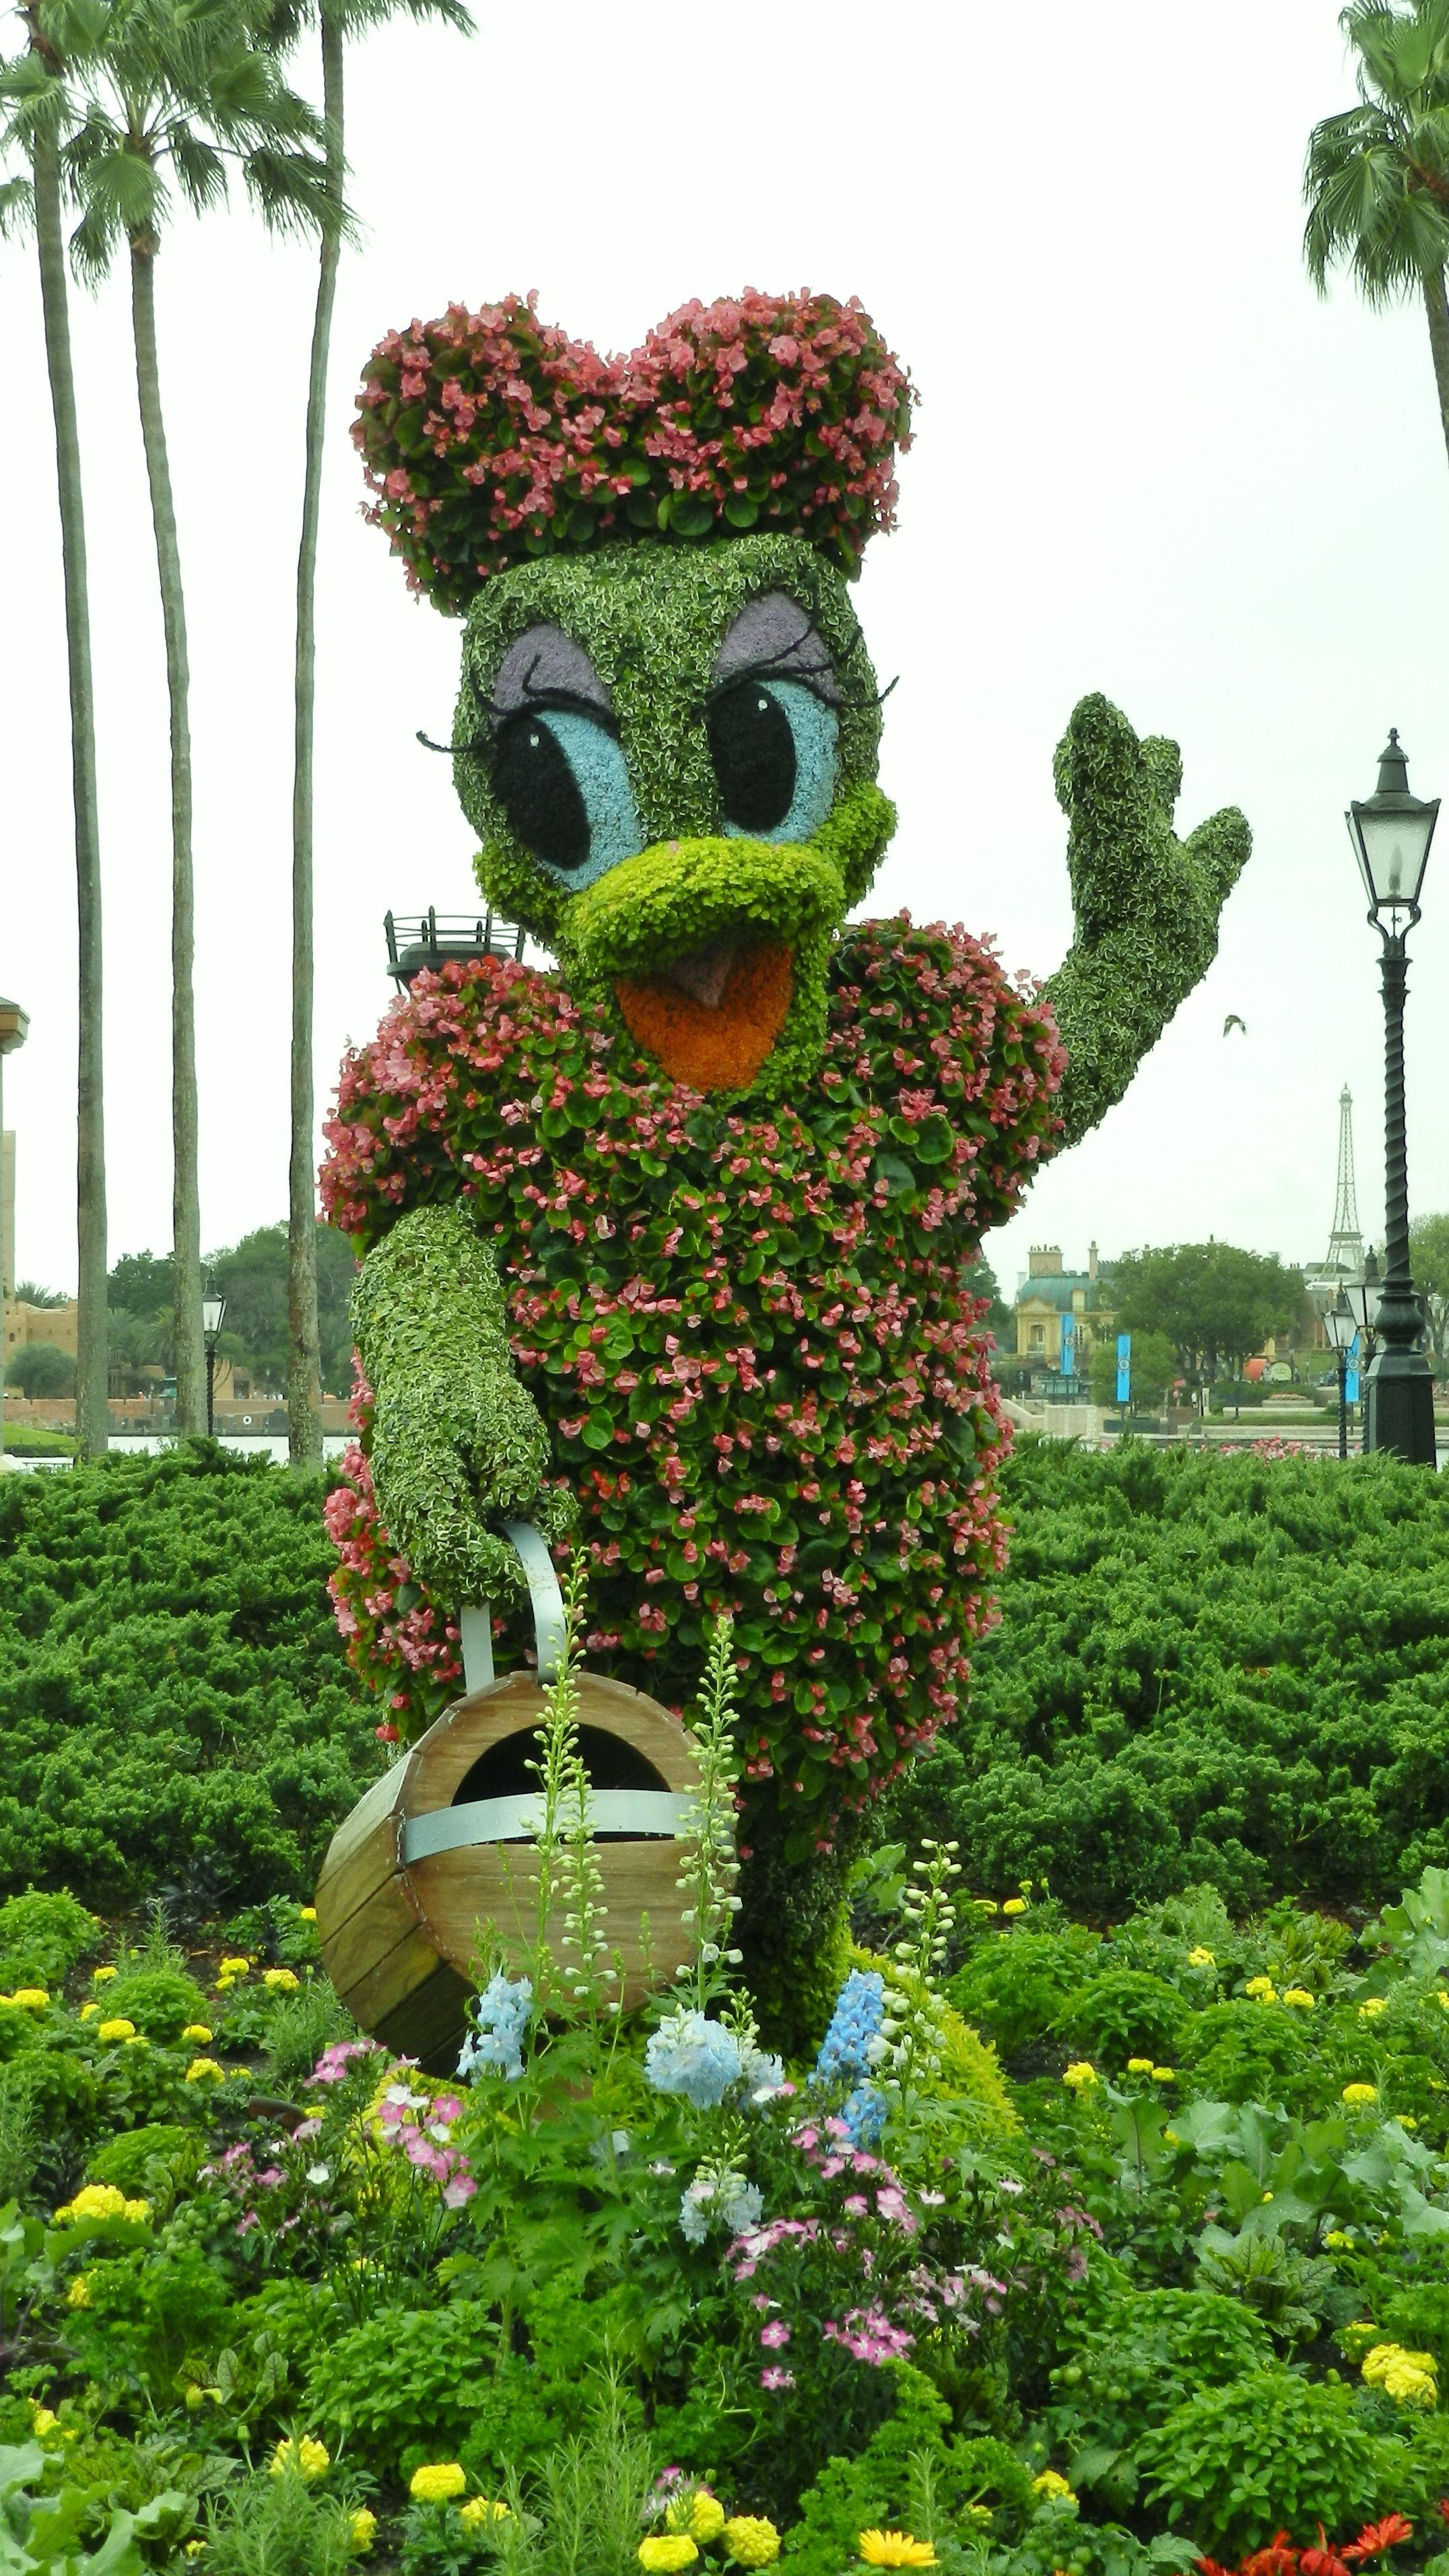 Daisy duck topiary walt disney world jardiner a for Jardin walt disney